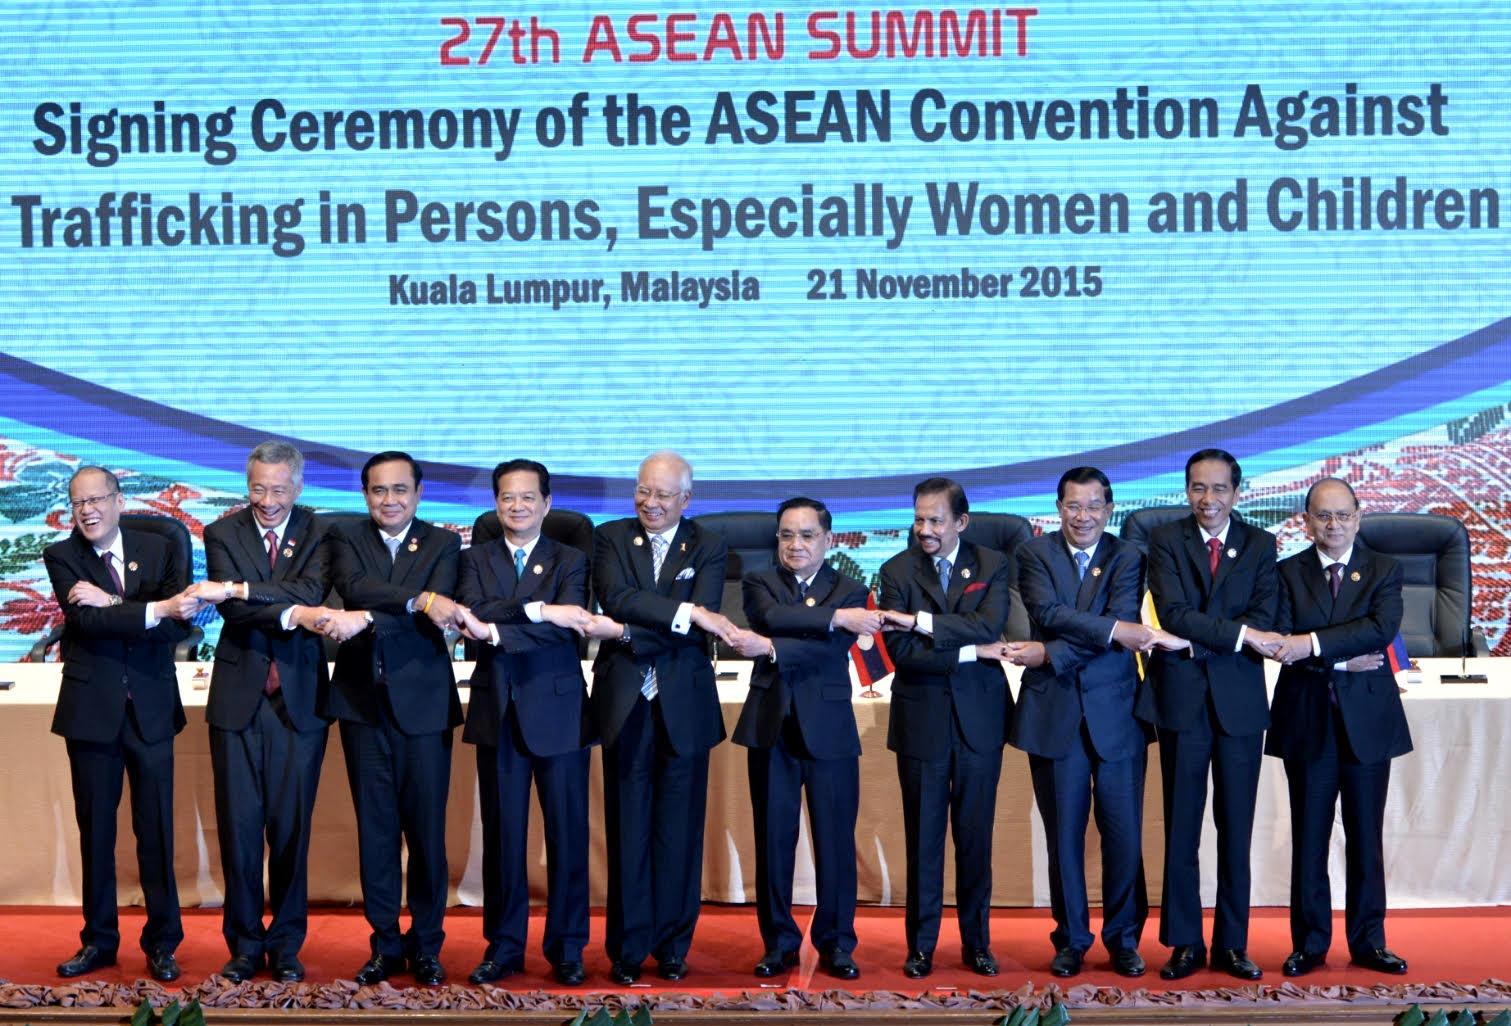 Para pemimpin negara-negara ASEAN bergandengan tangan dalam pembukaan KTT ke-27 ASEAN, di Kuala Lumpur, Malaysia, Sabtu (21/11)